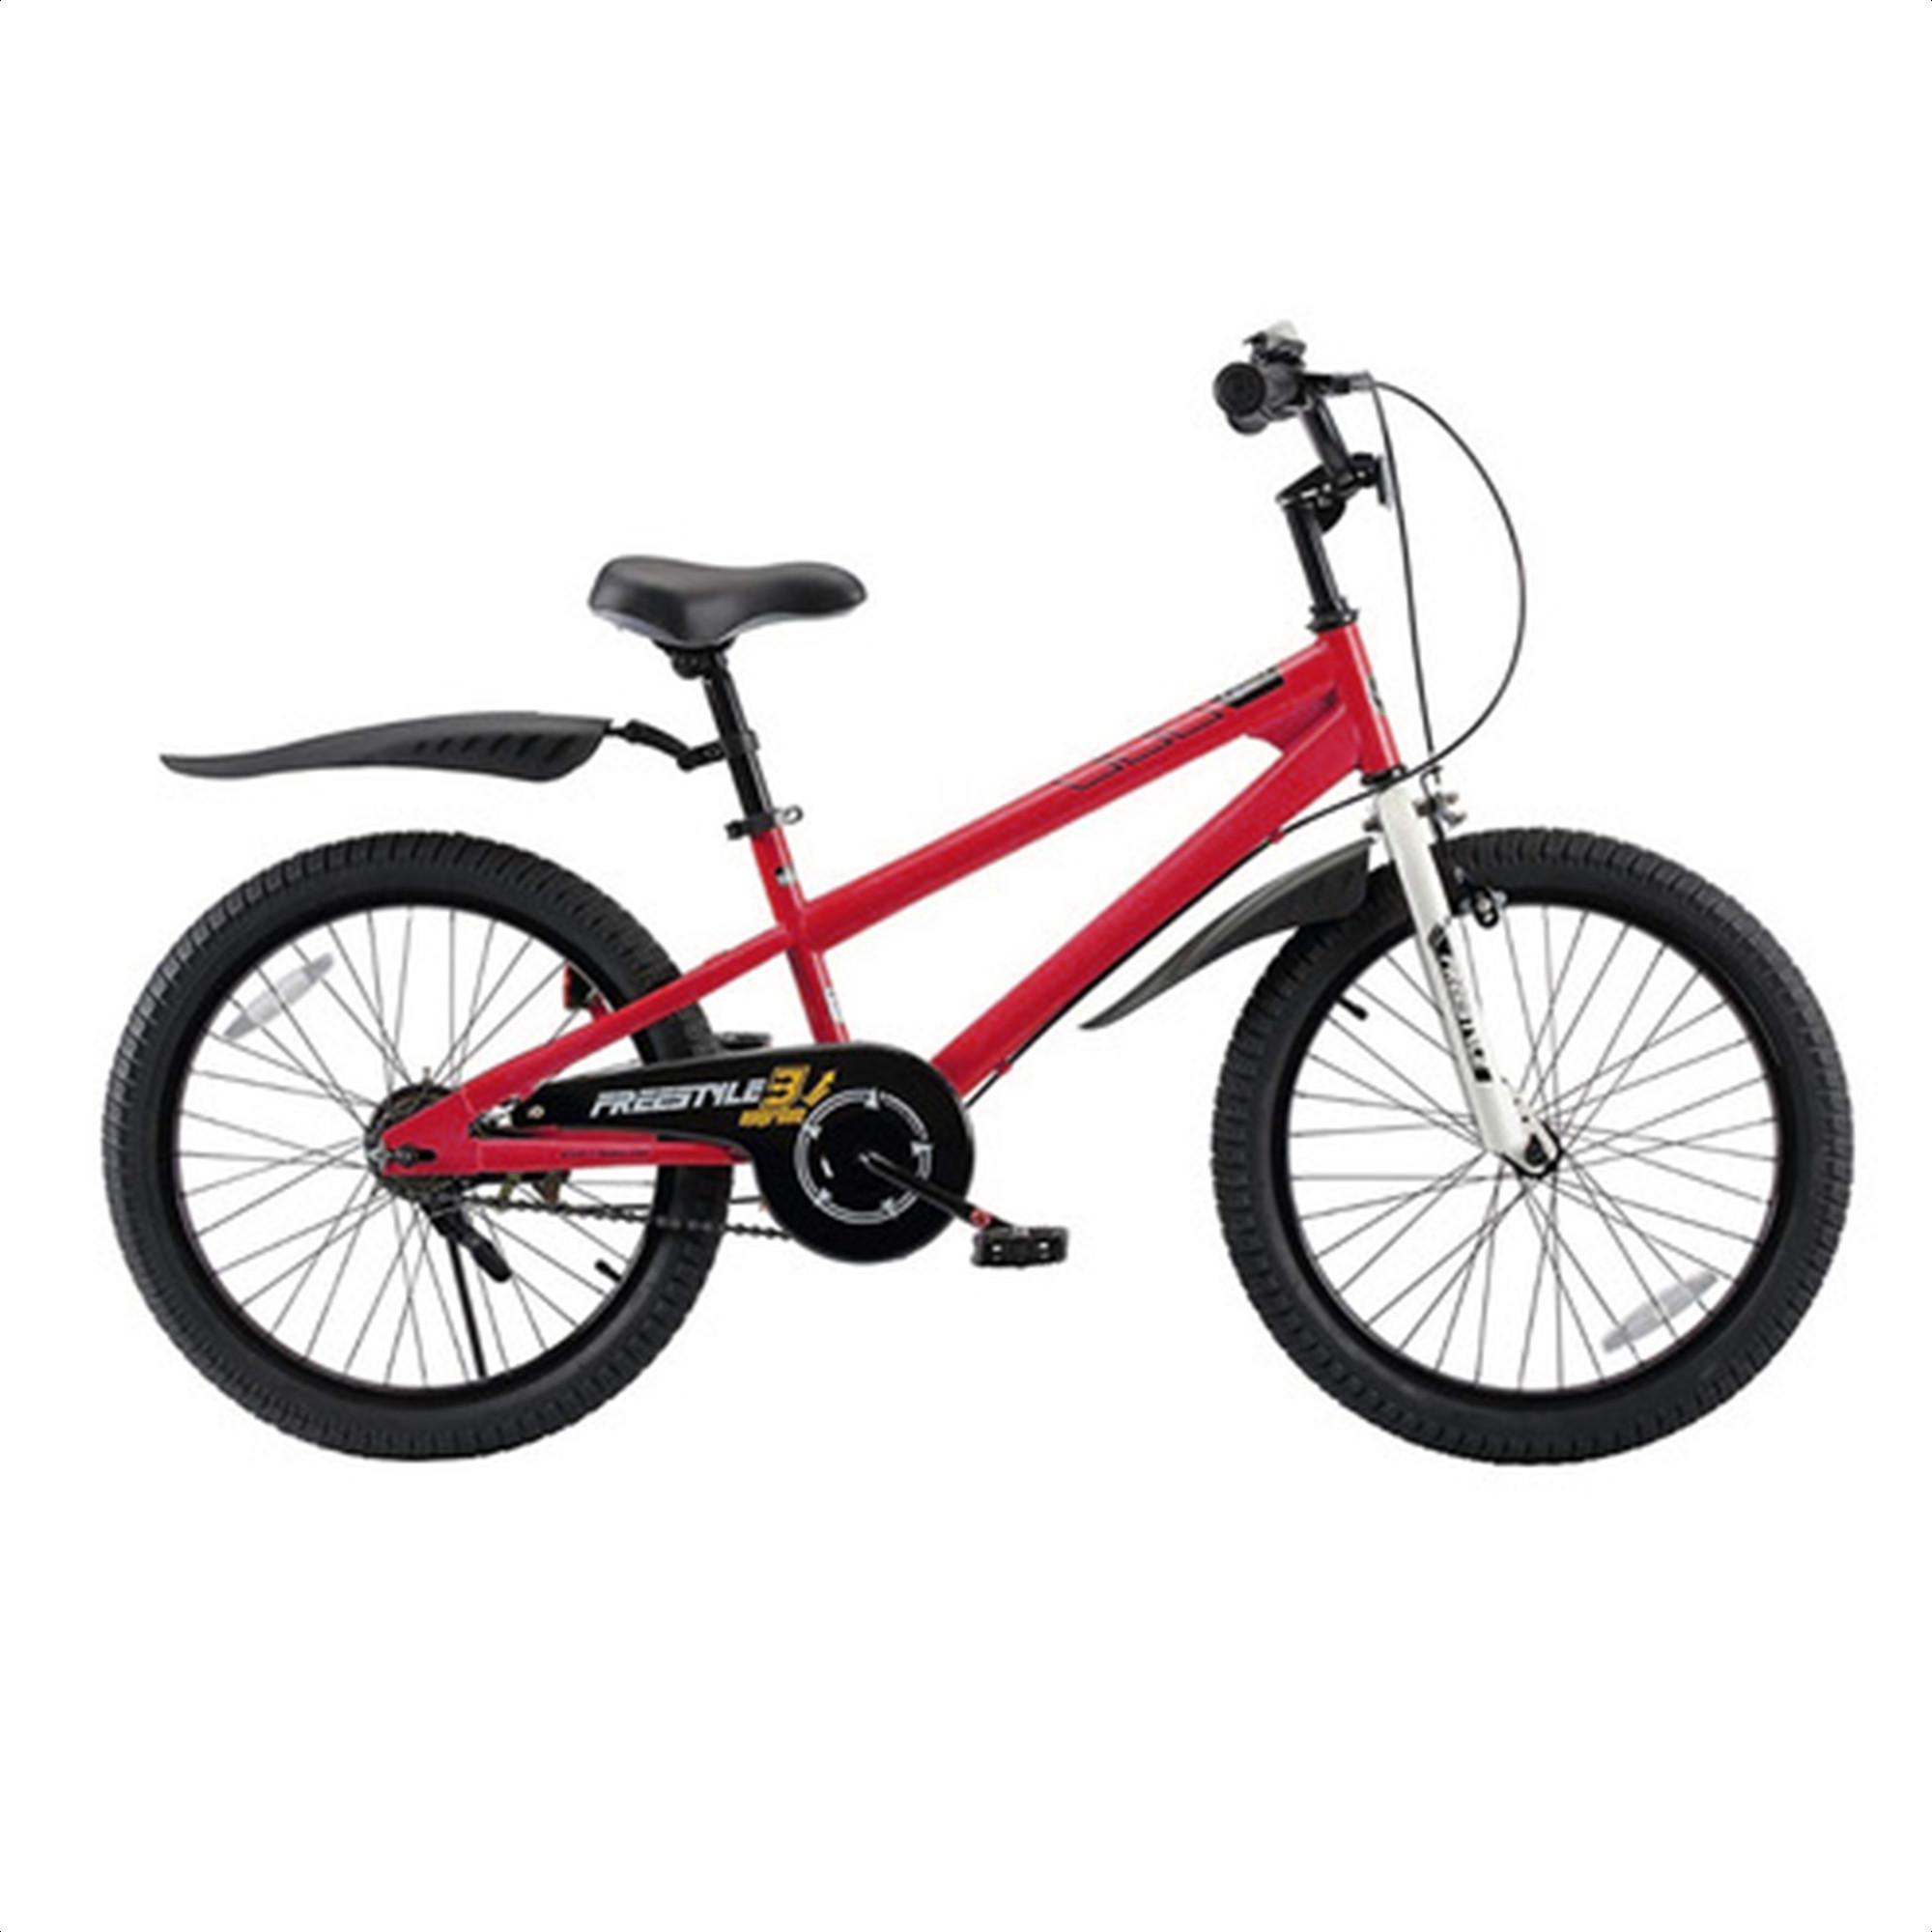 Bicicleta Infantil Royal Baby Freestyle Sin Cambios Rodado 20